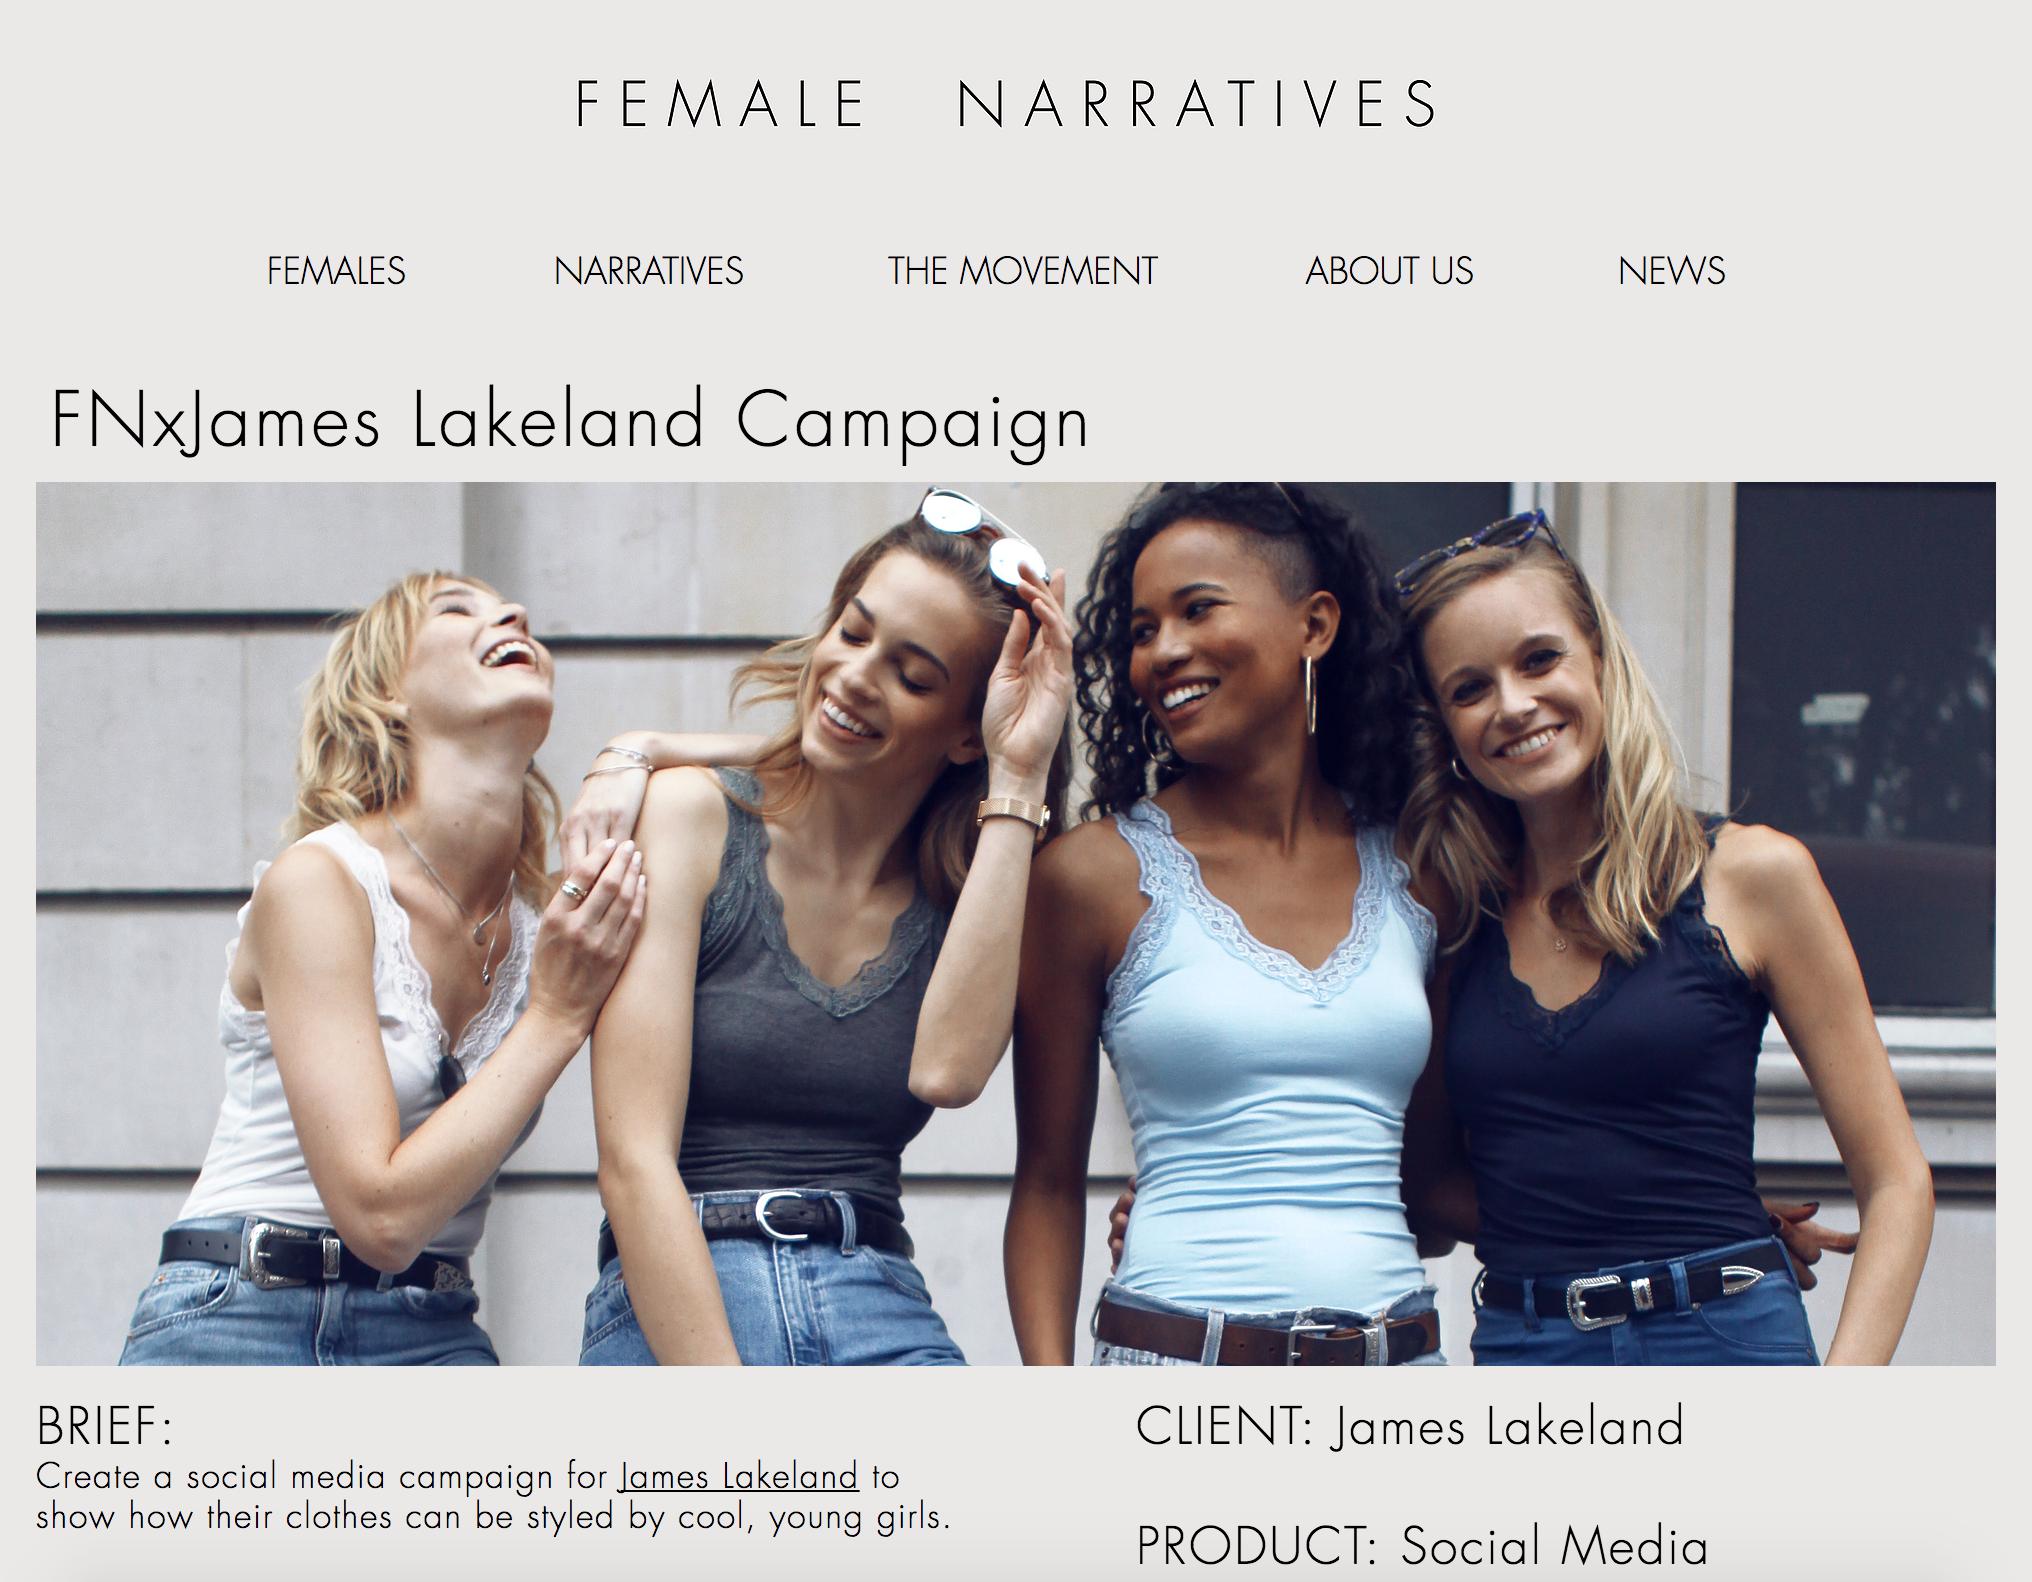 www.femalenarratives.com/fnxjameslakeland